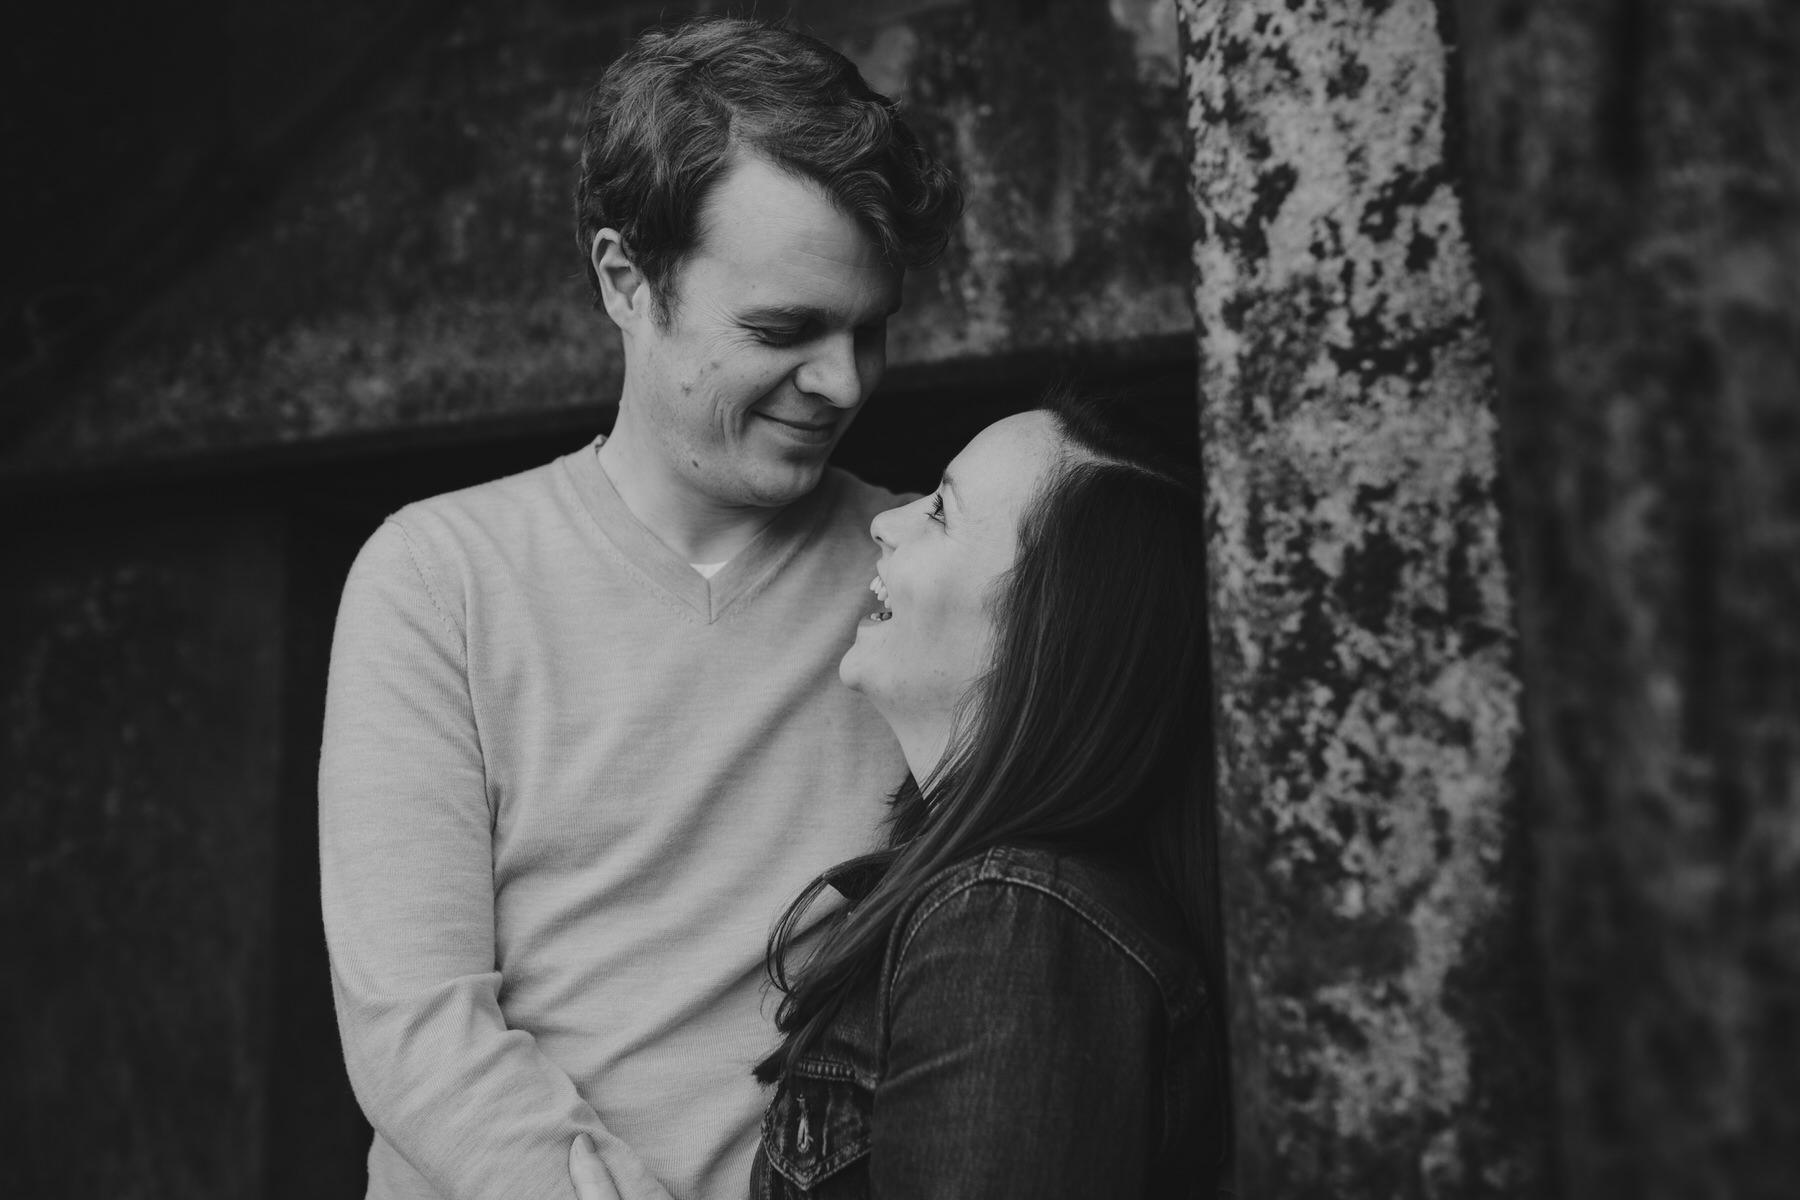 49-Quirky-engagement-London-BW-romantic-pose-idea.jpg